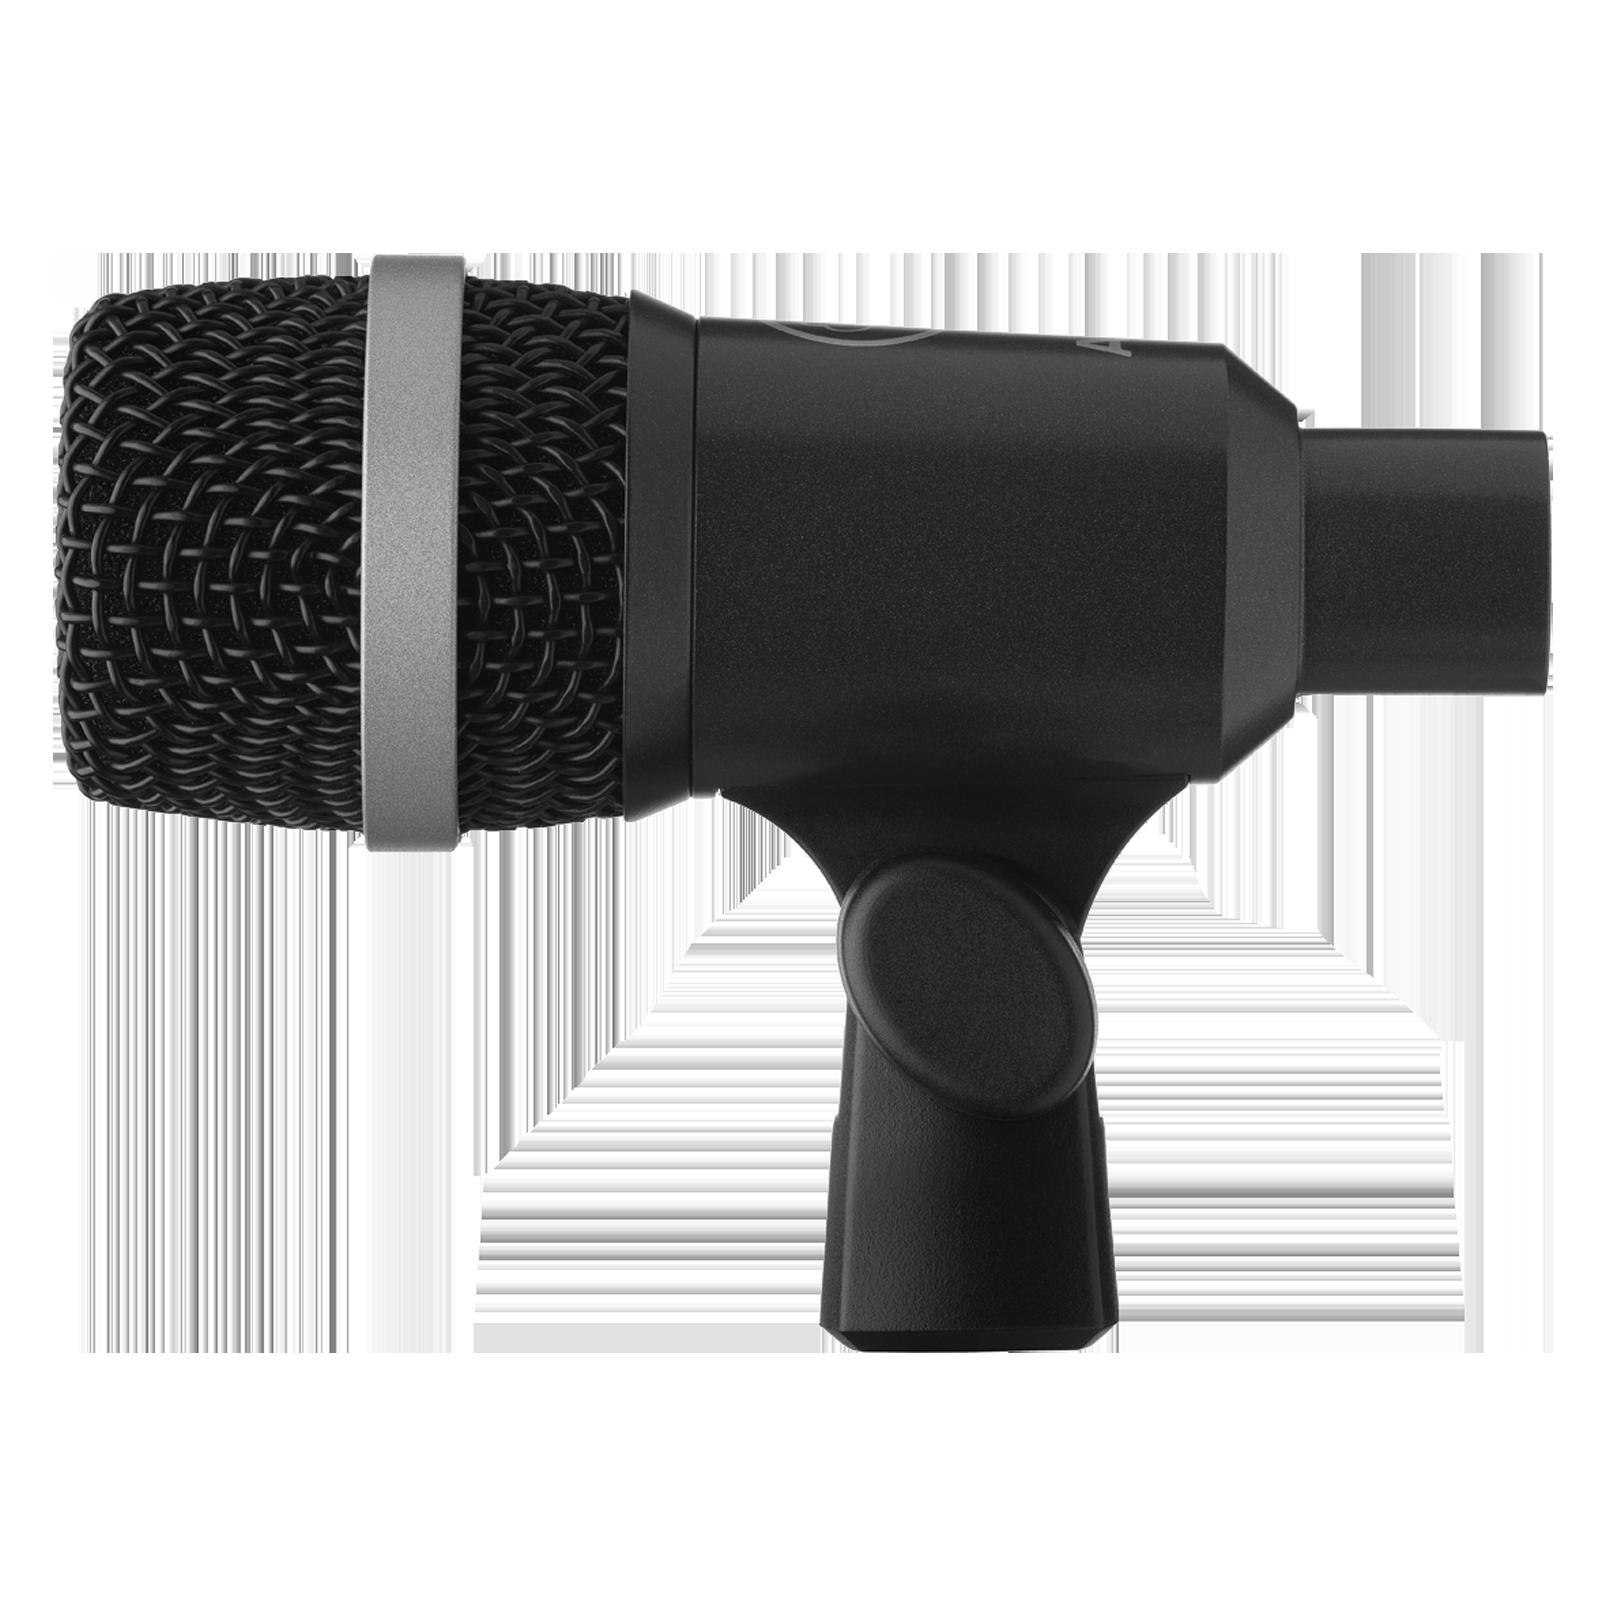 D40 - Black - Professional dynamic instrument microphone - Left